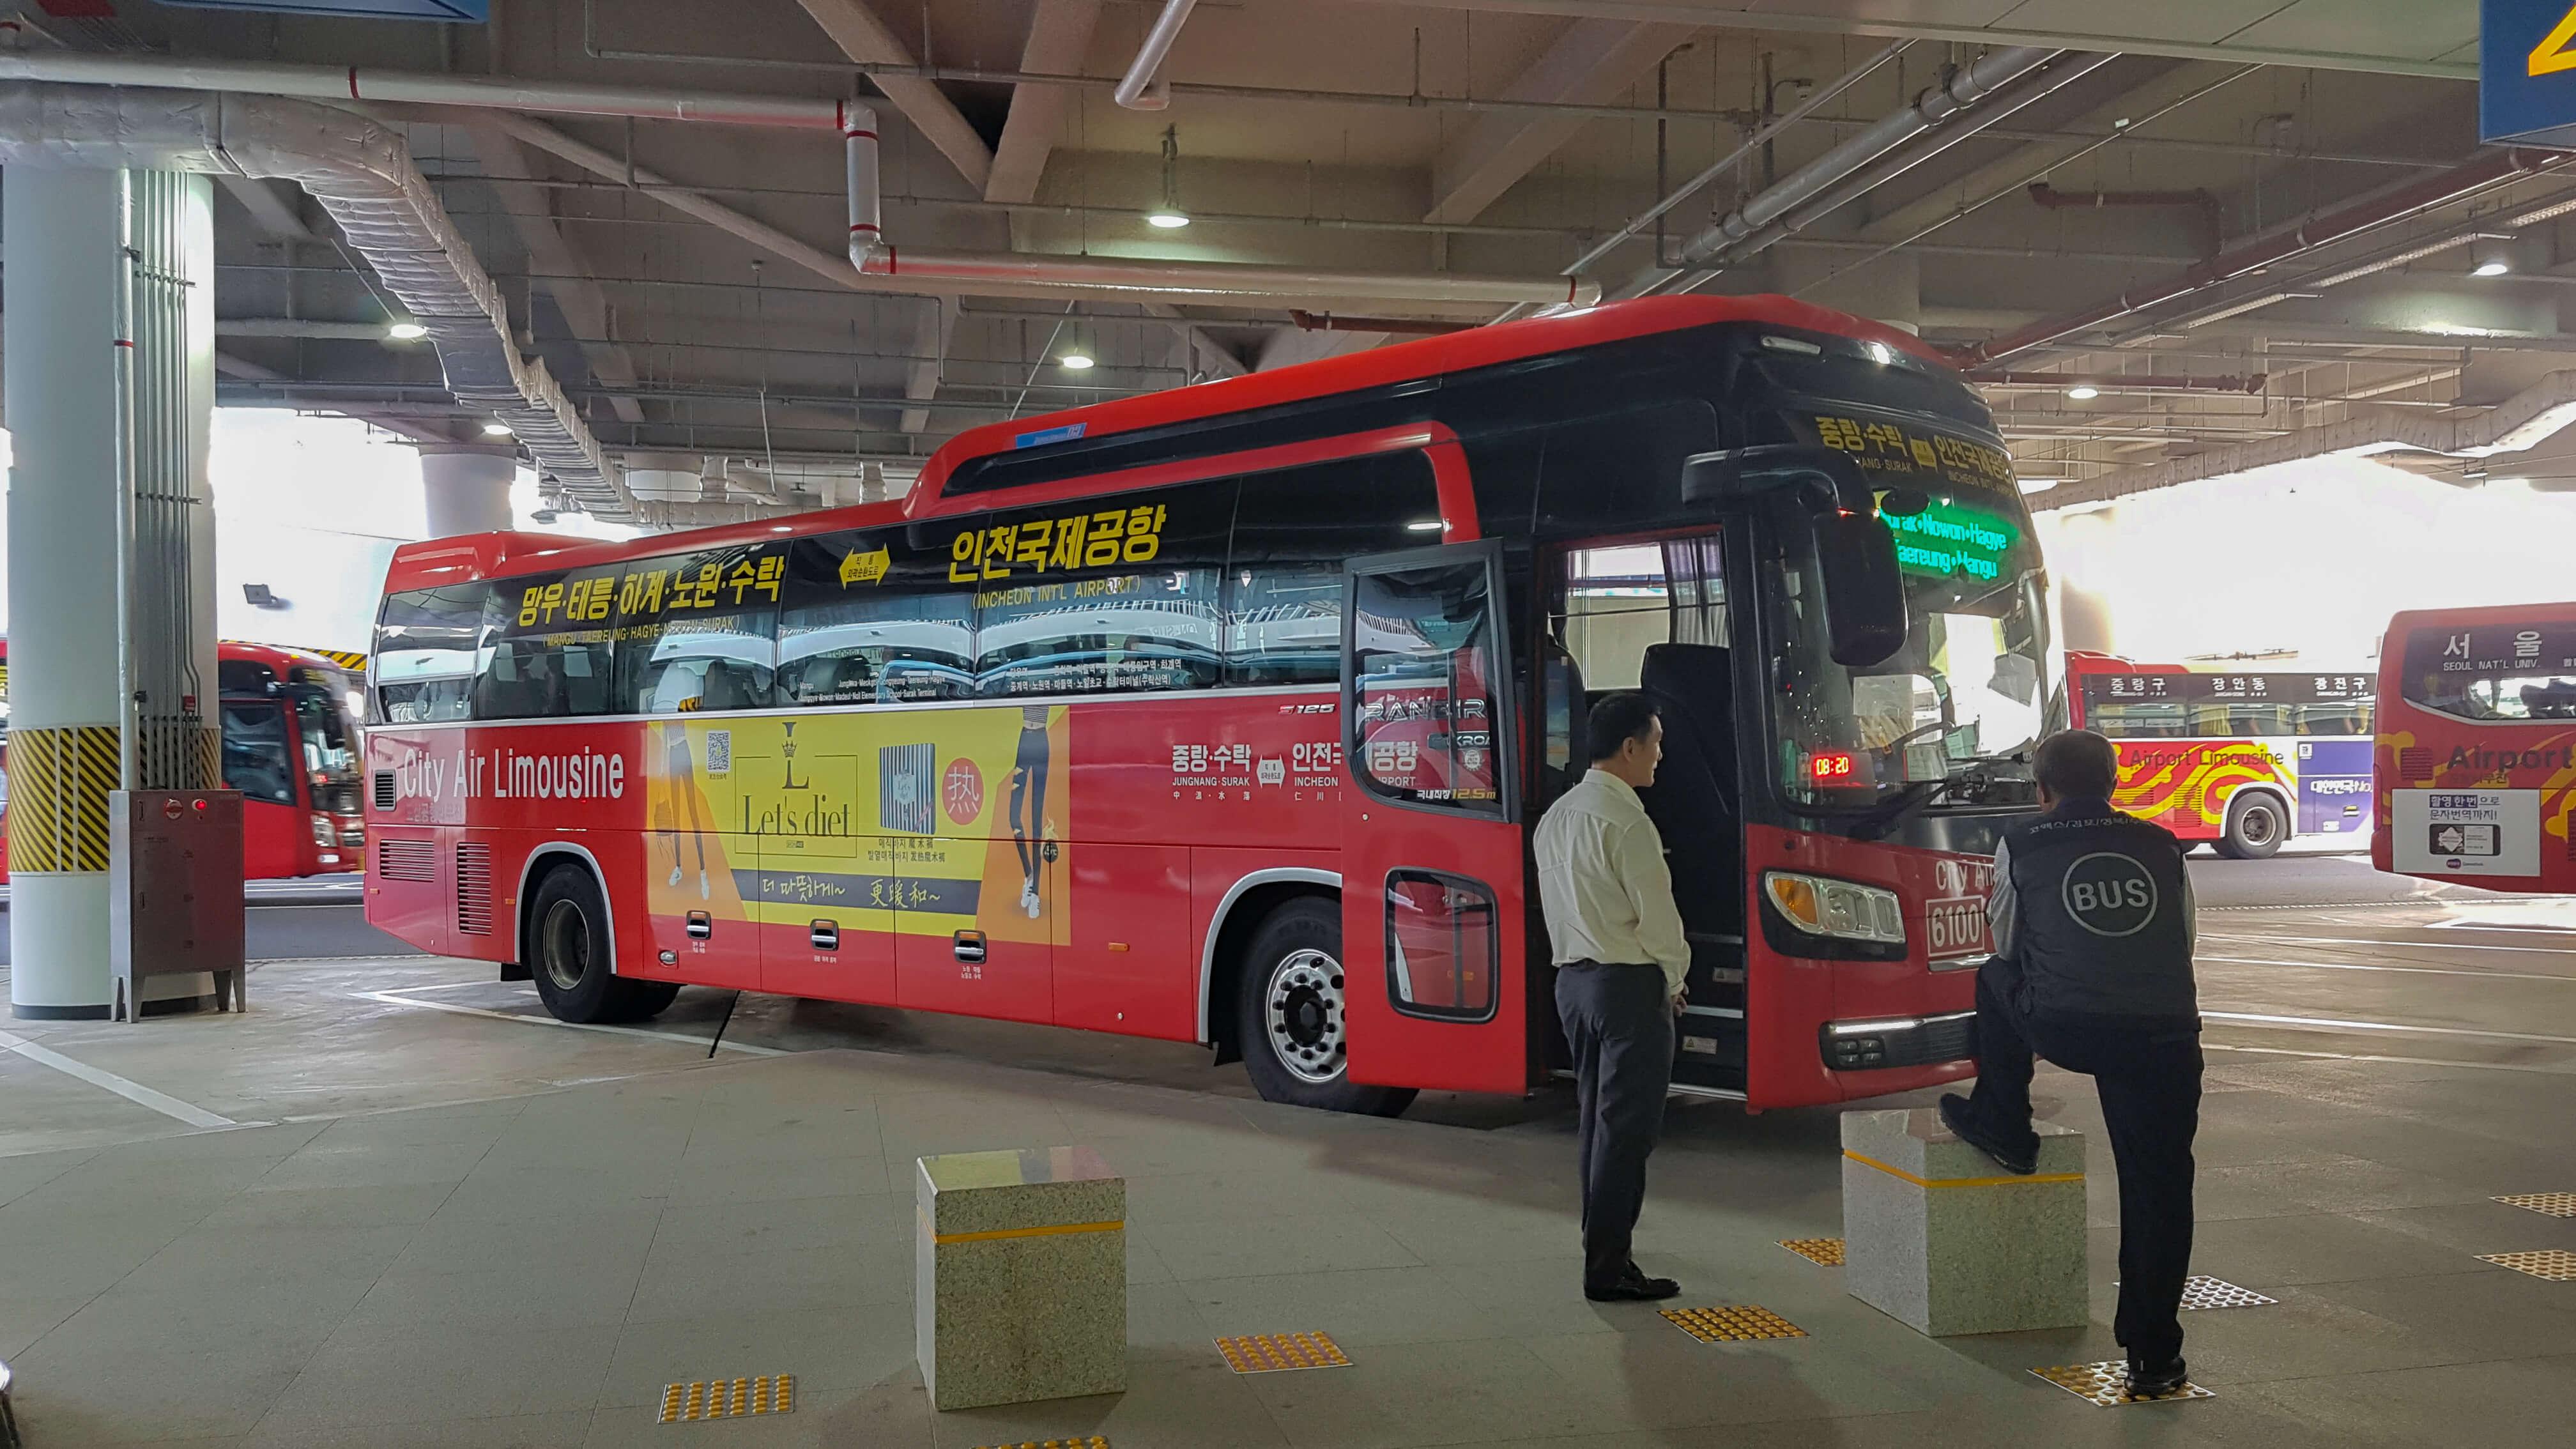 City Air Limousine - Flughafenbusse